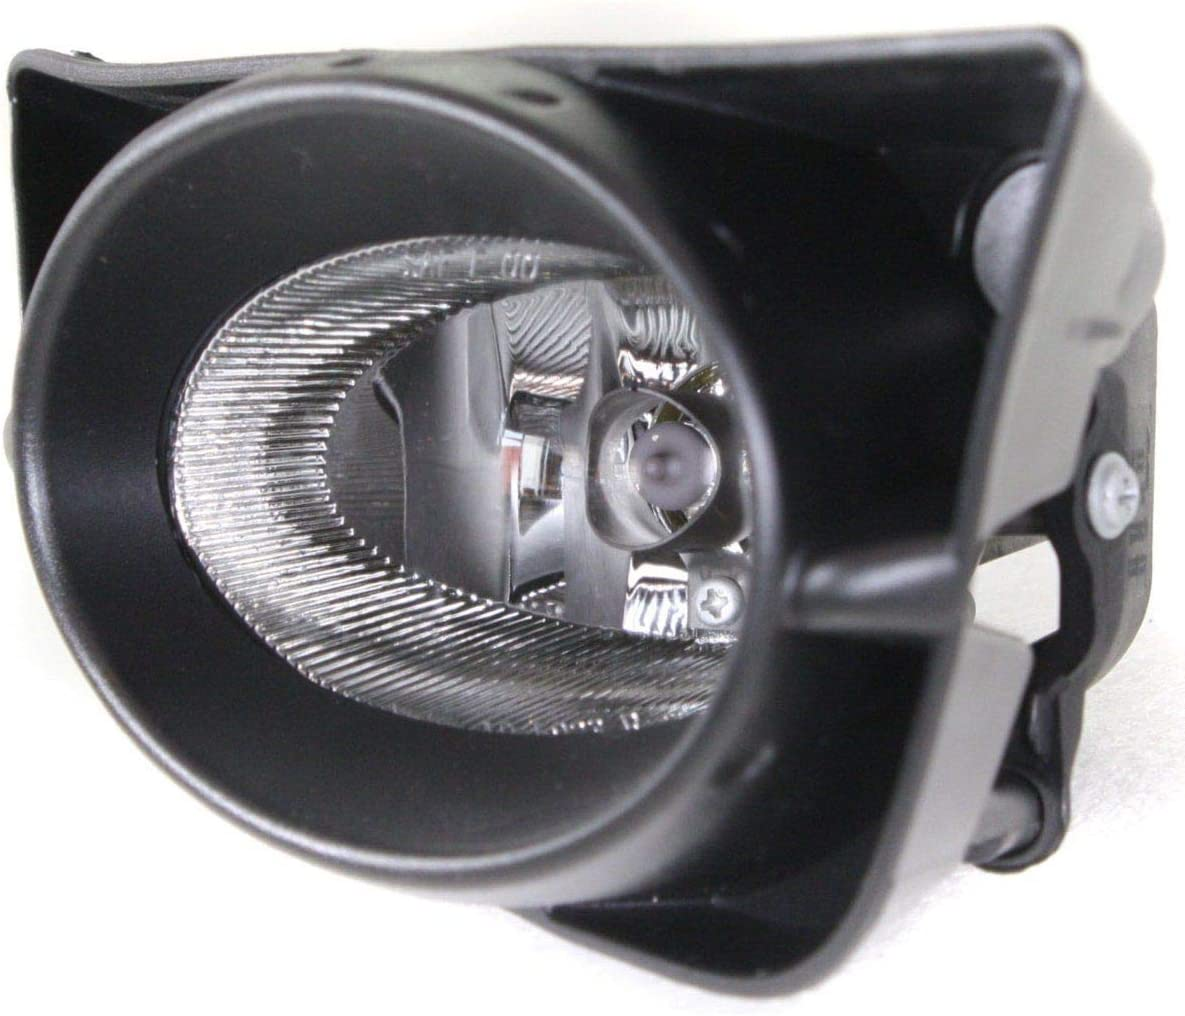 Details about  /New Depo Passenger Side Fog Light For 2009-2011 Honda Fit 33901TK6305 HO2593122